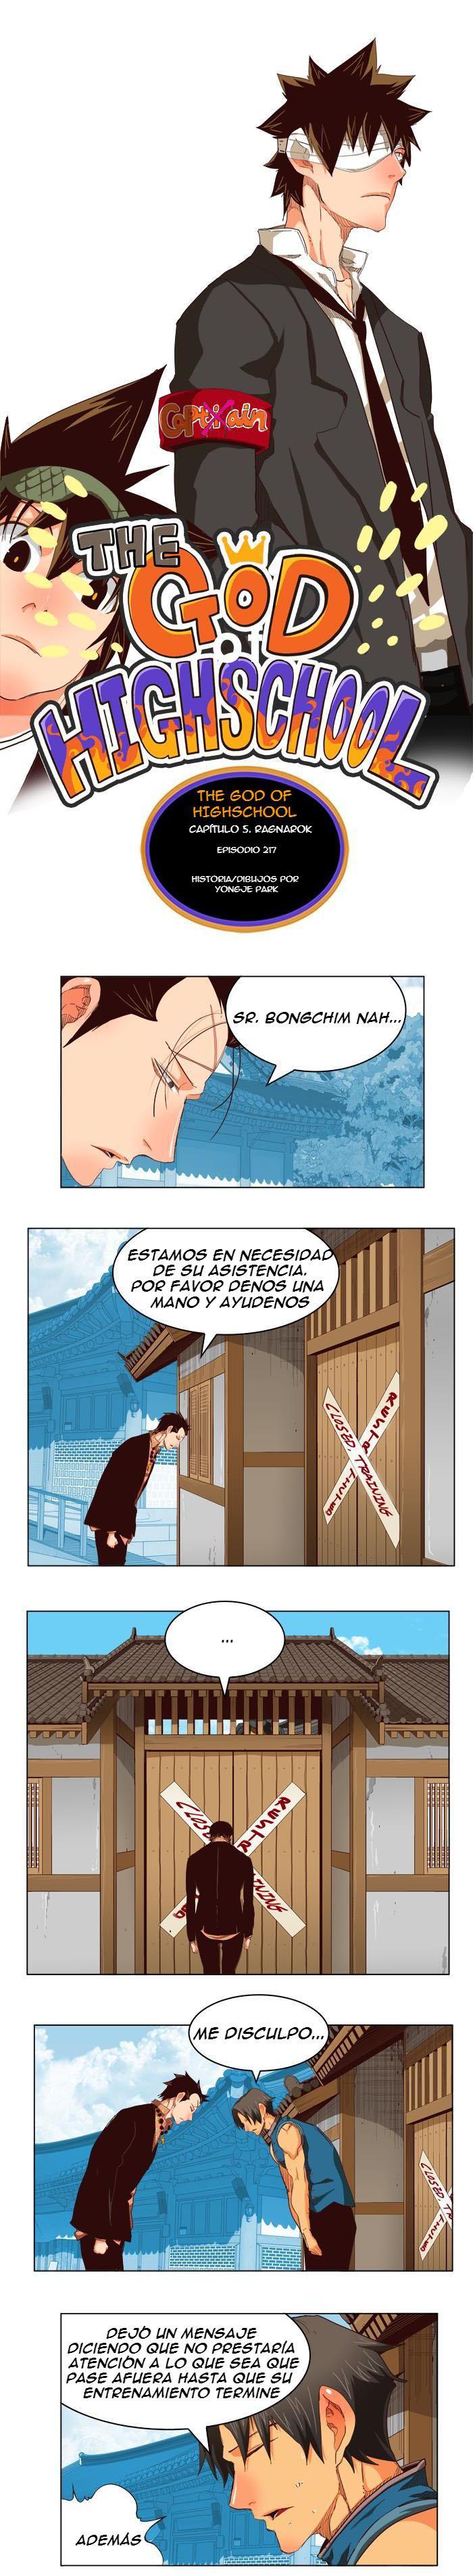 http://c5.ninemanga.com/es_manga/37/485/454636/9cde04bbce5584c4cde587d6ee8d9f09.jpg Page 1